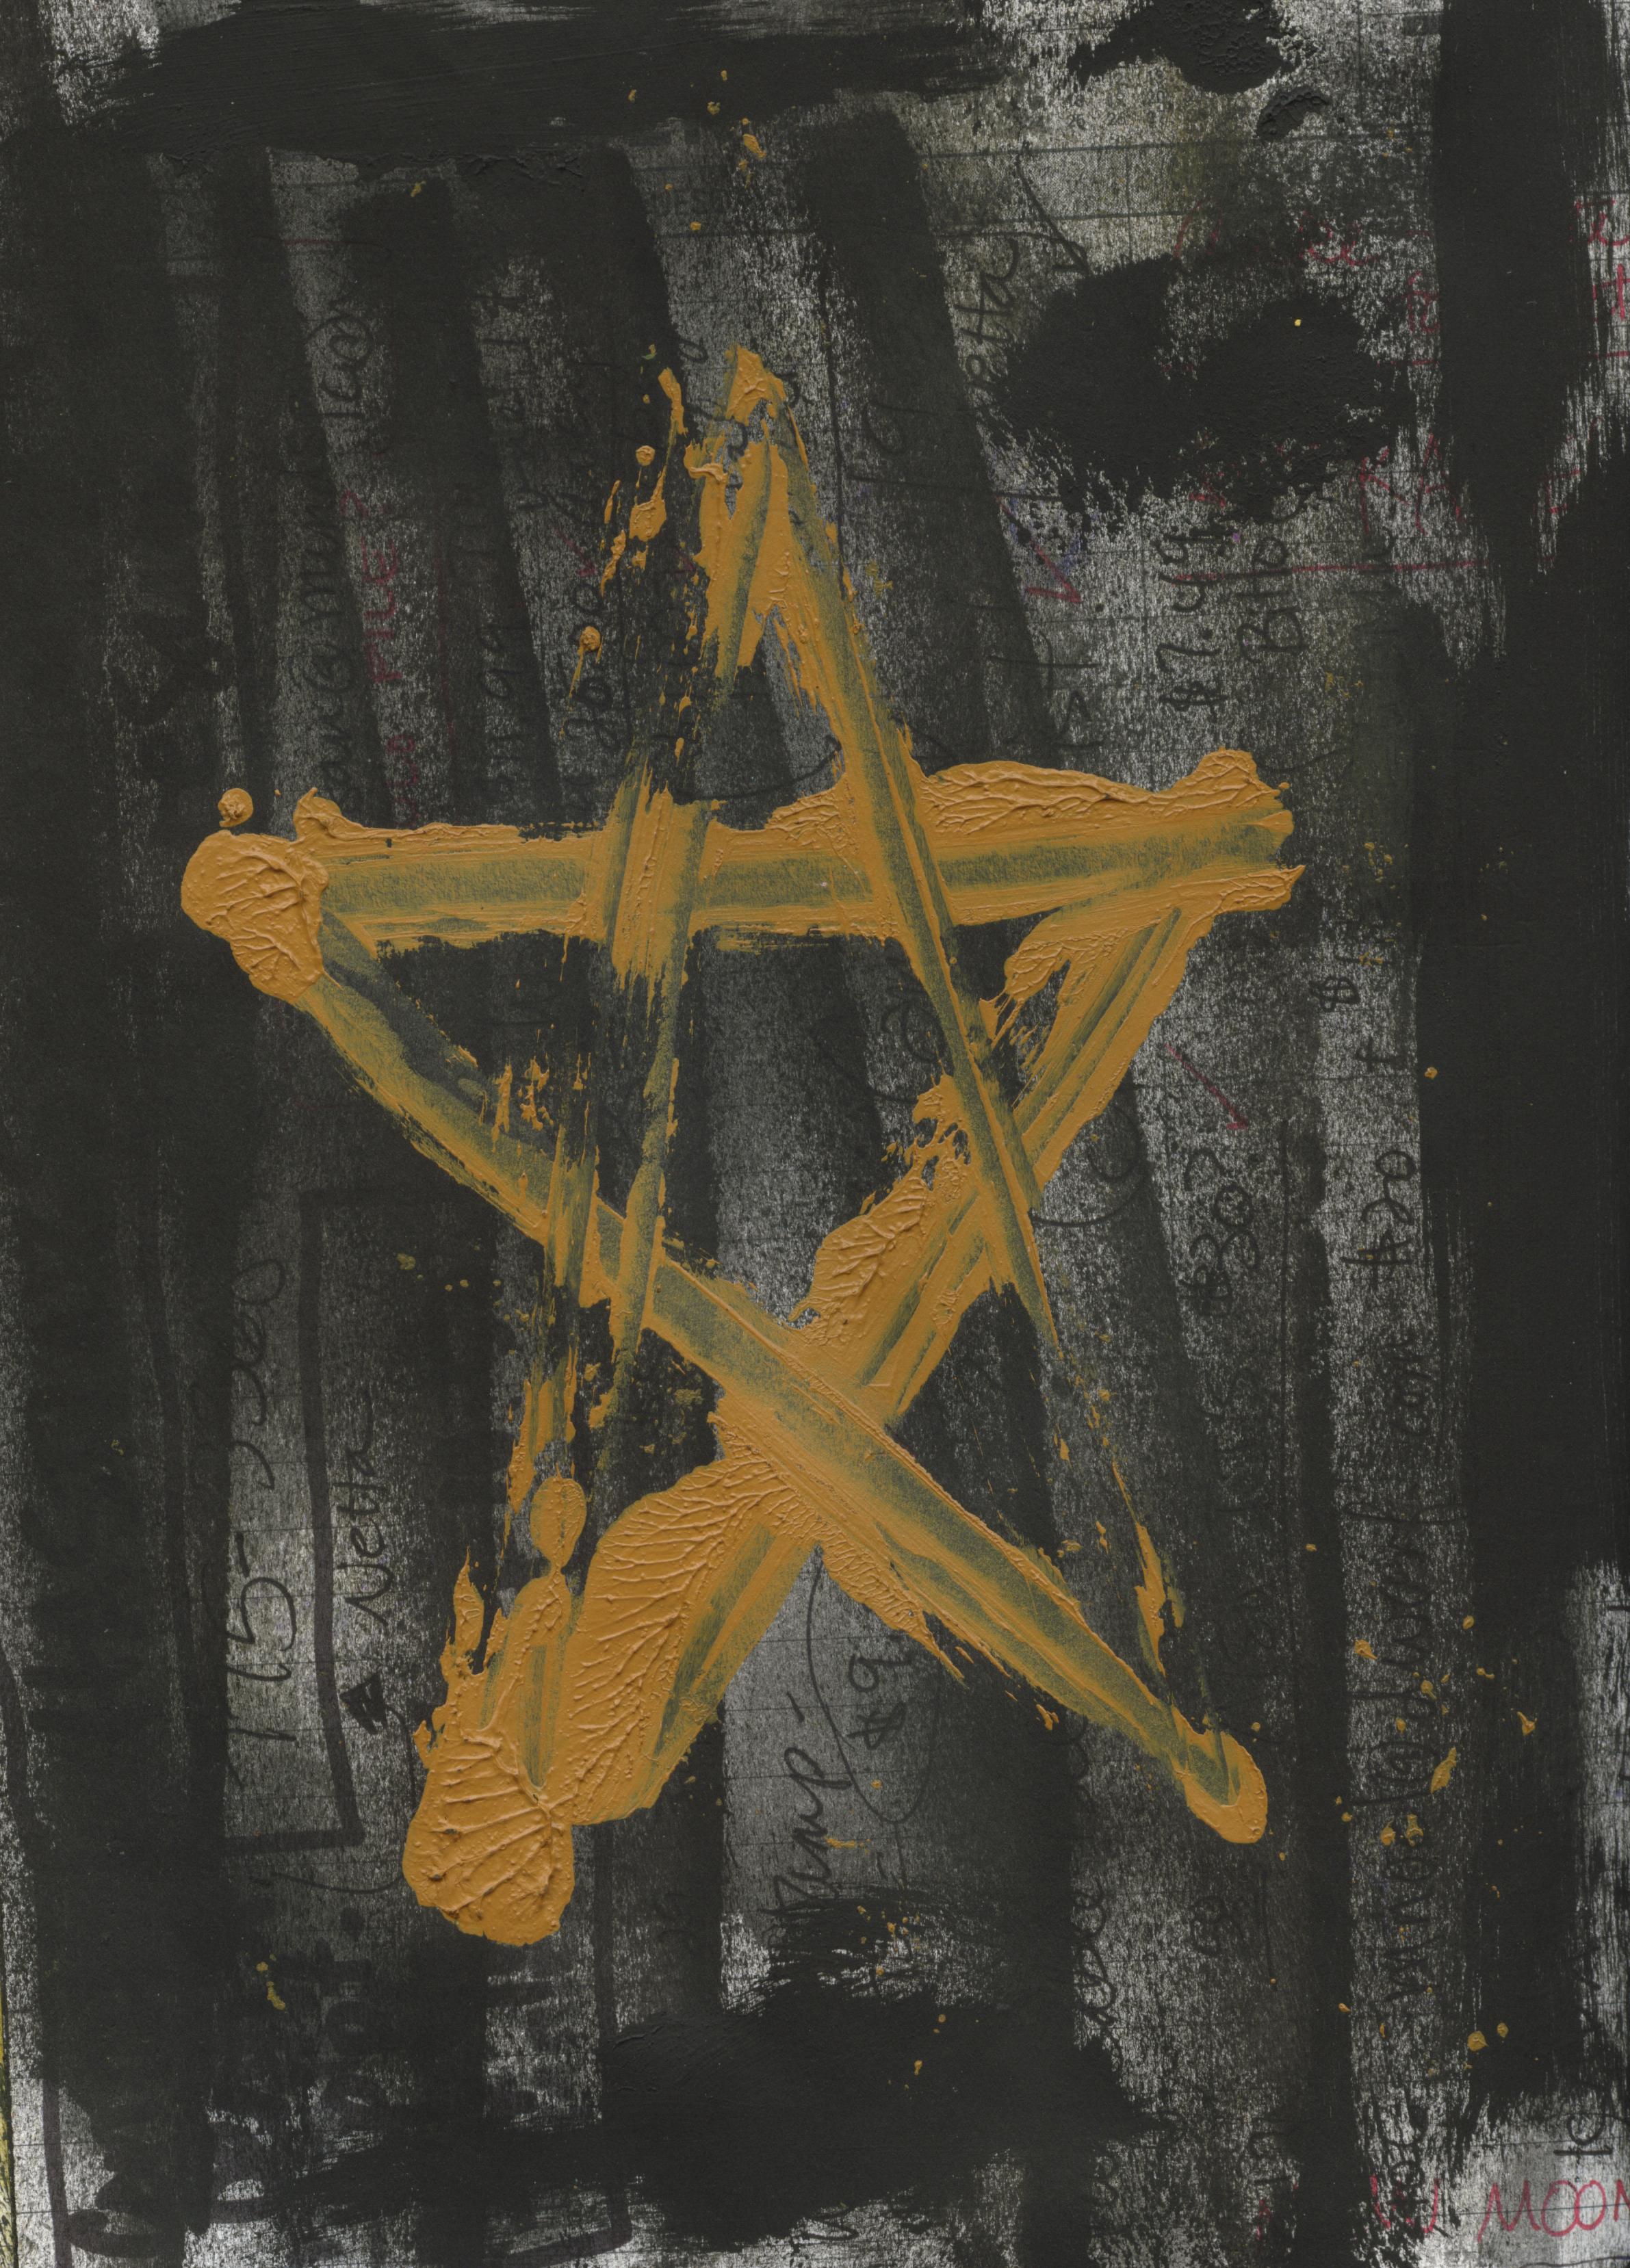 Vandals Use Satanic Symbols To Deface Catholic Church Women Of Grace